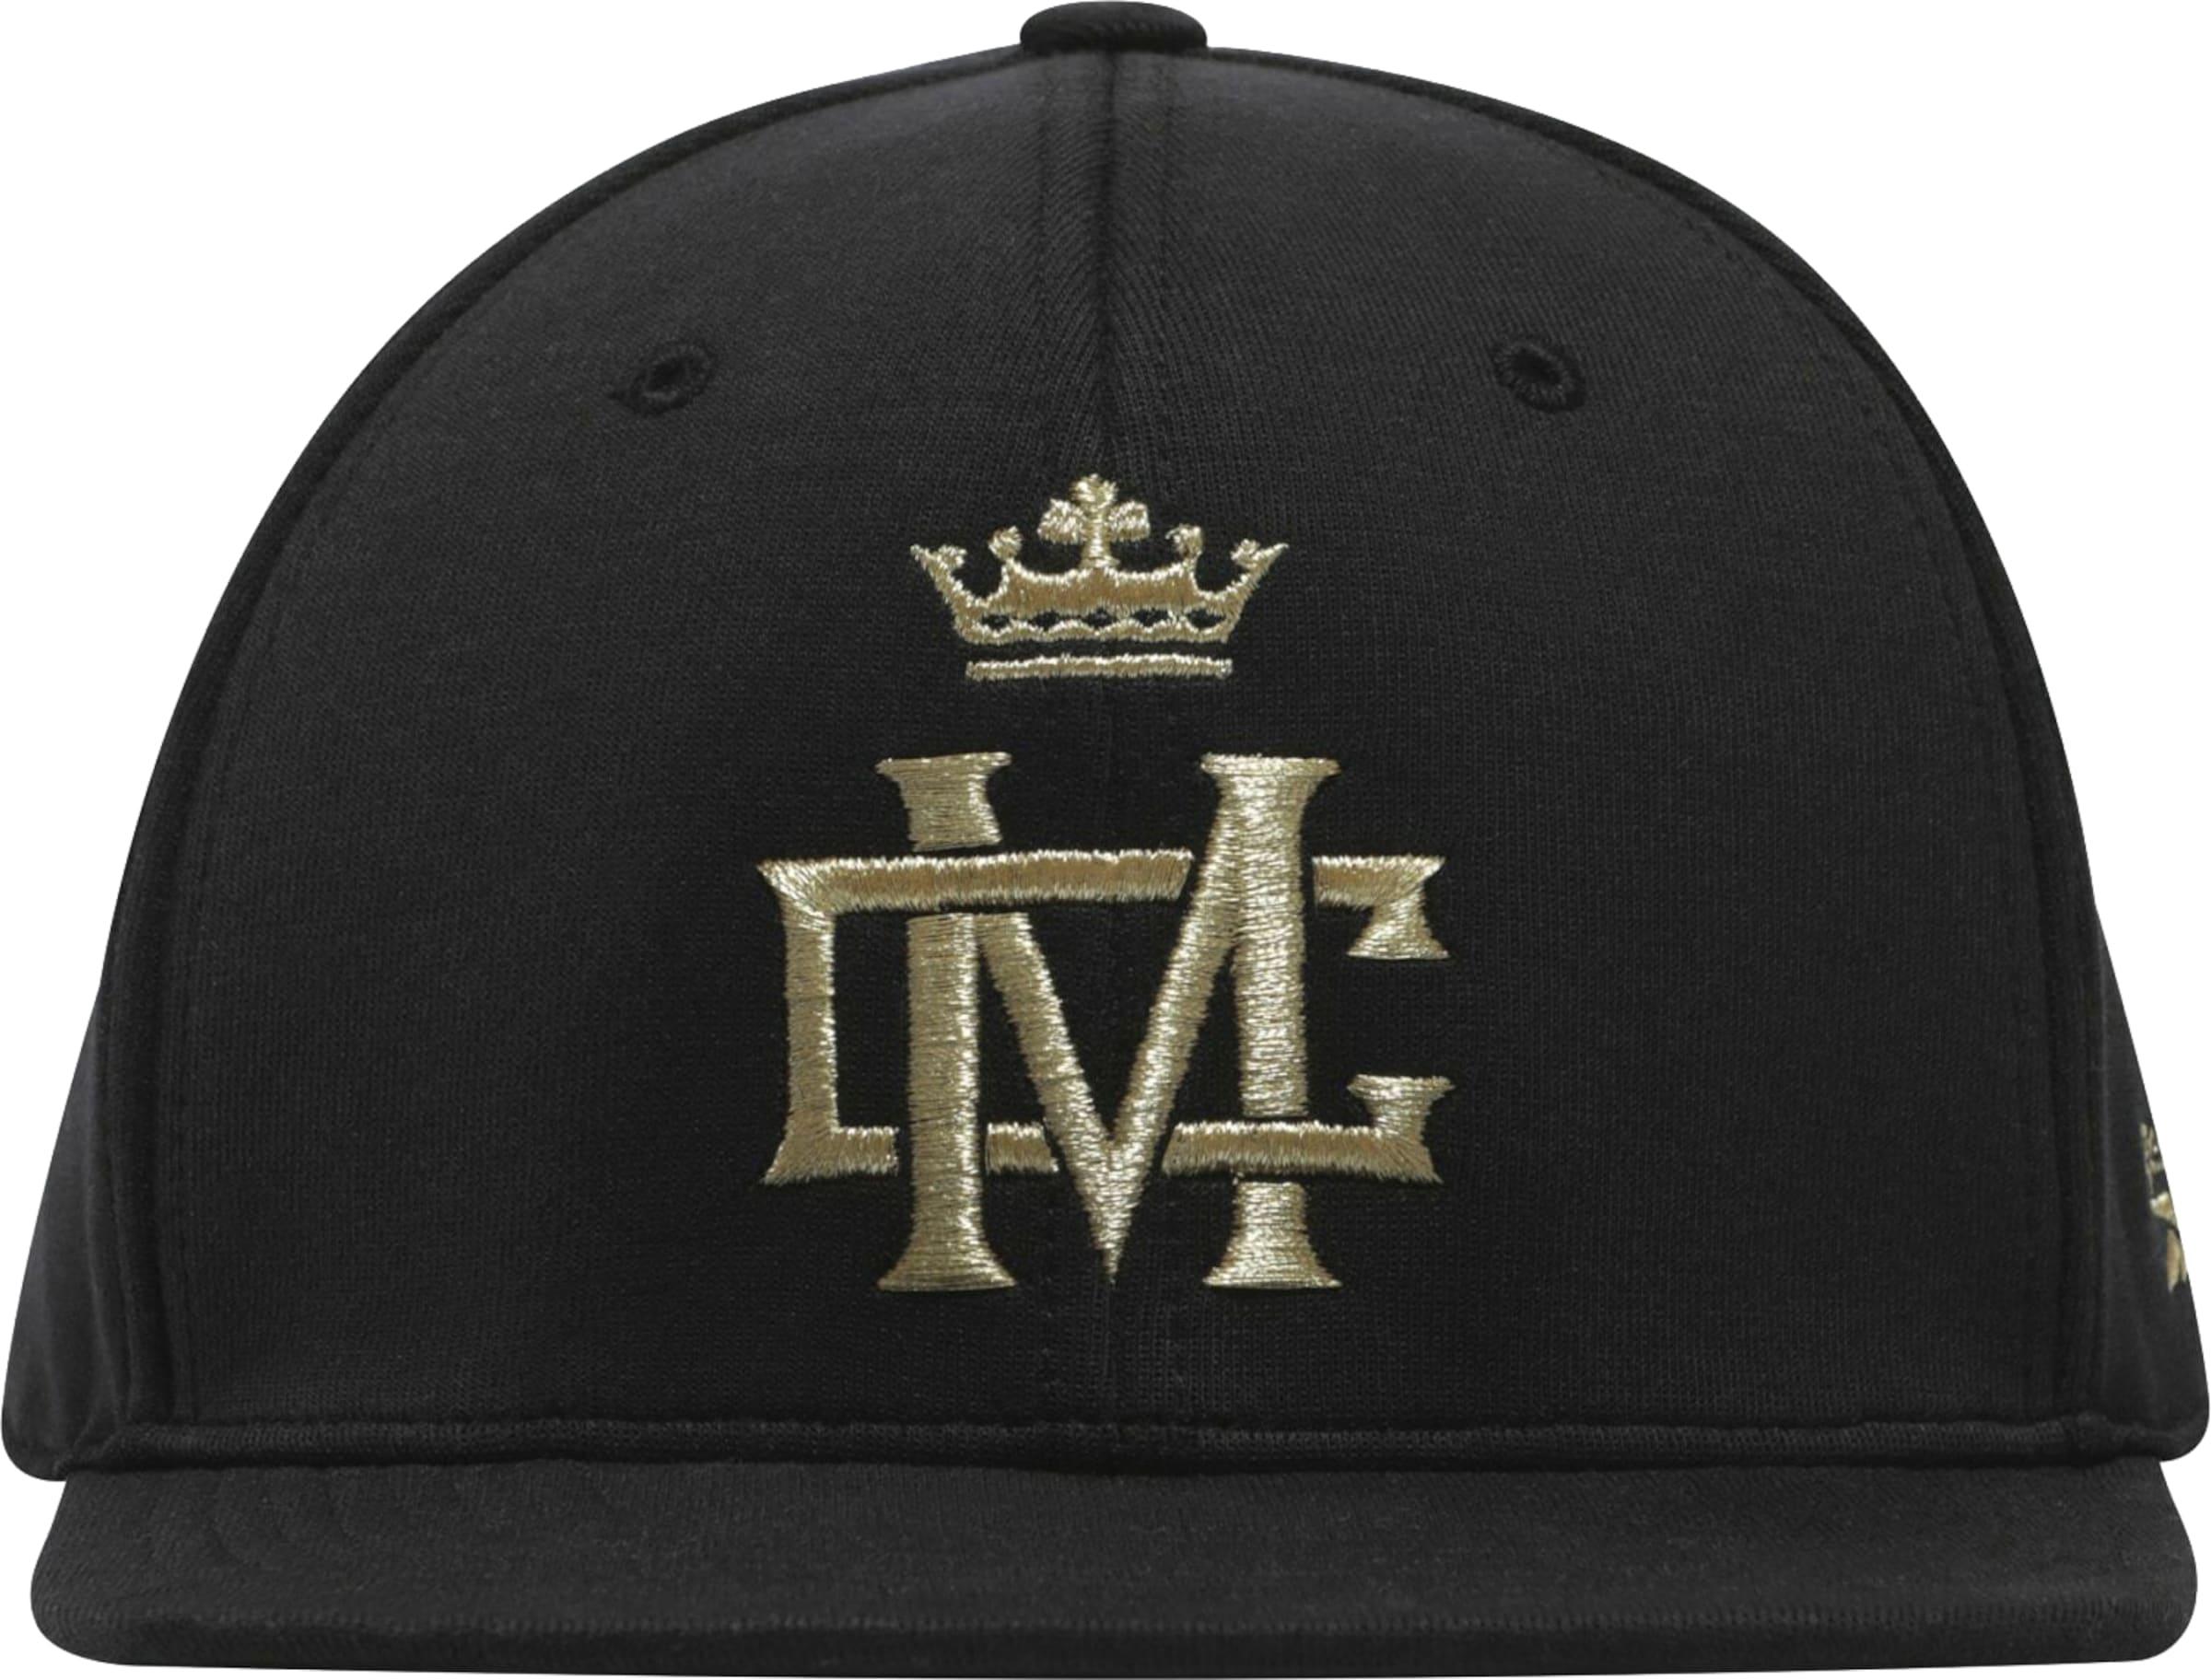 REEBOK Cap in gold / schwarz